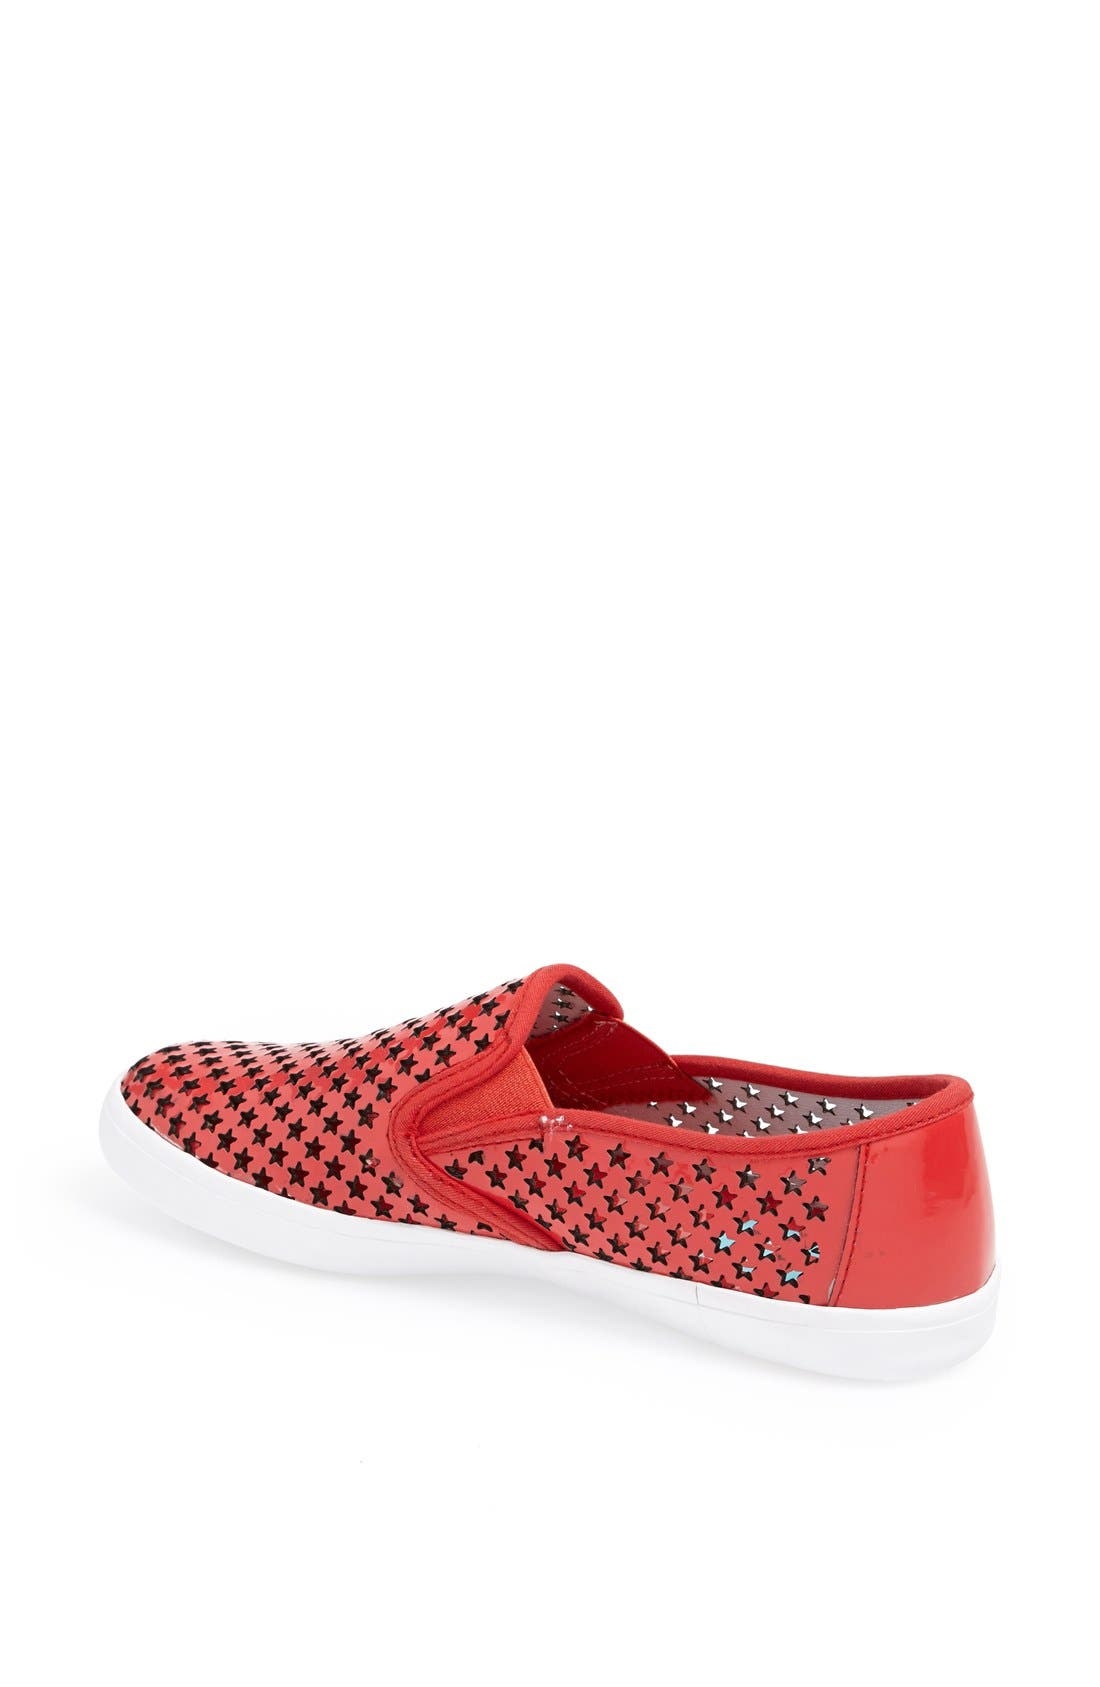 Alternate Image 2  - Jeffrey Campbell 'Dougray' Patent Cutout Slip-On Sneaker